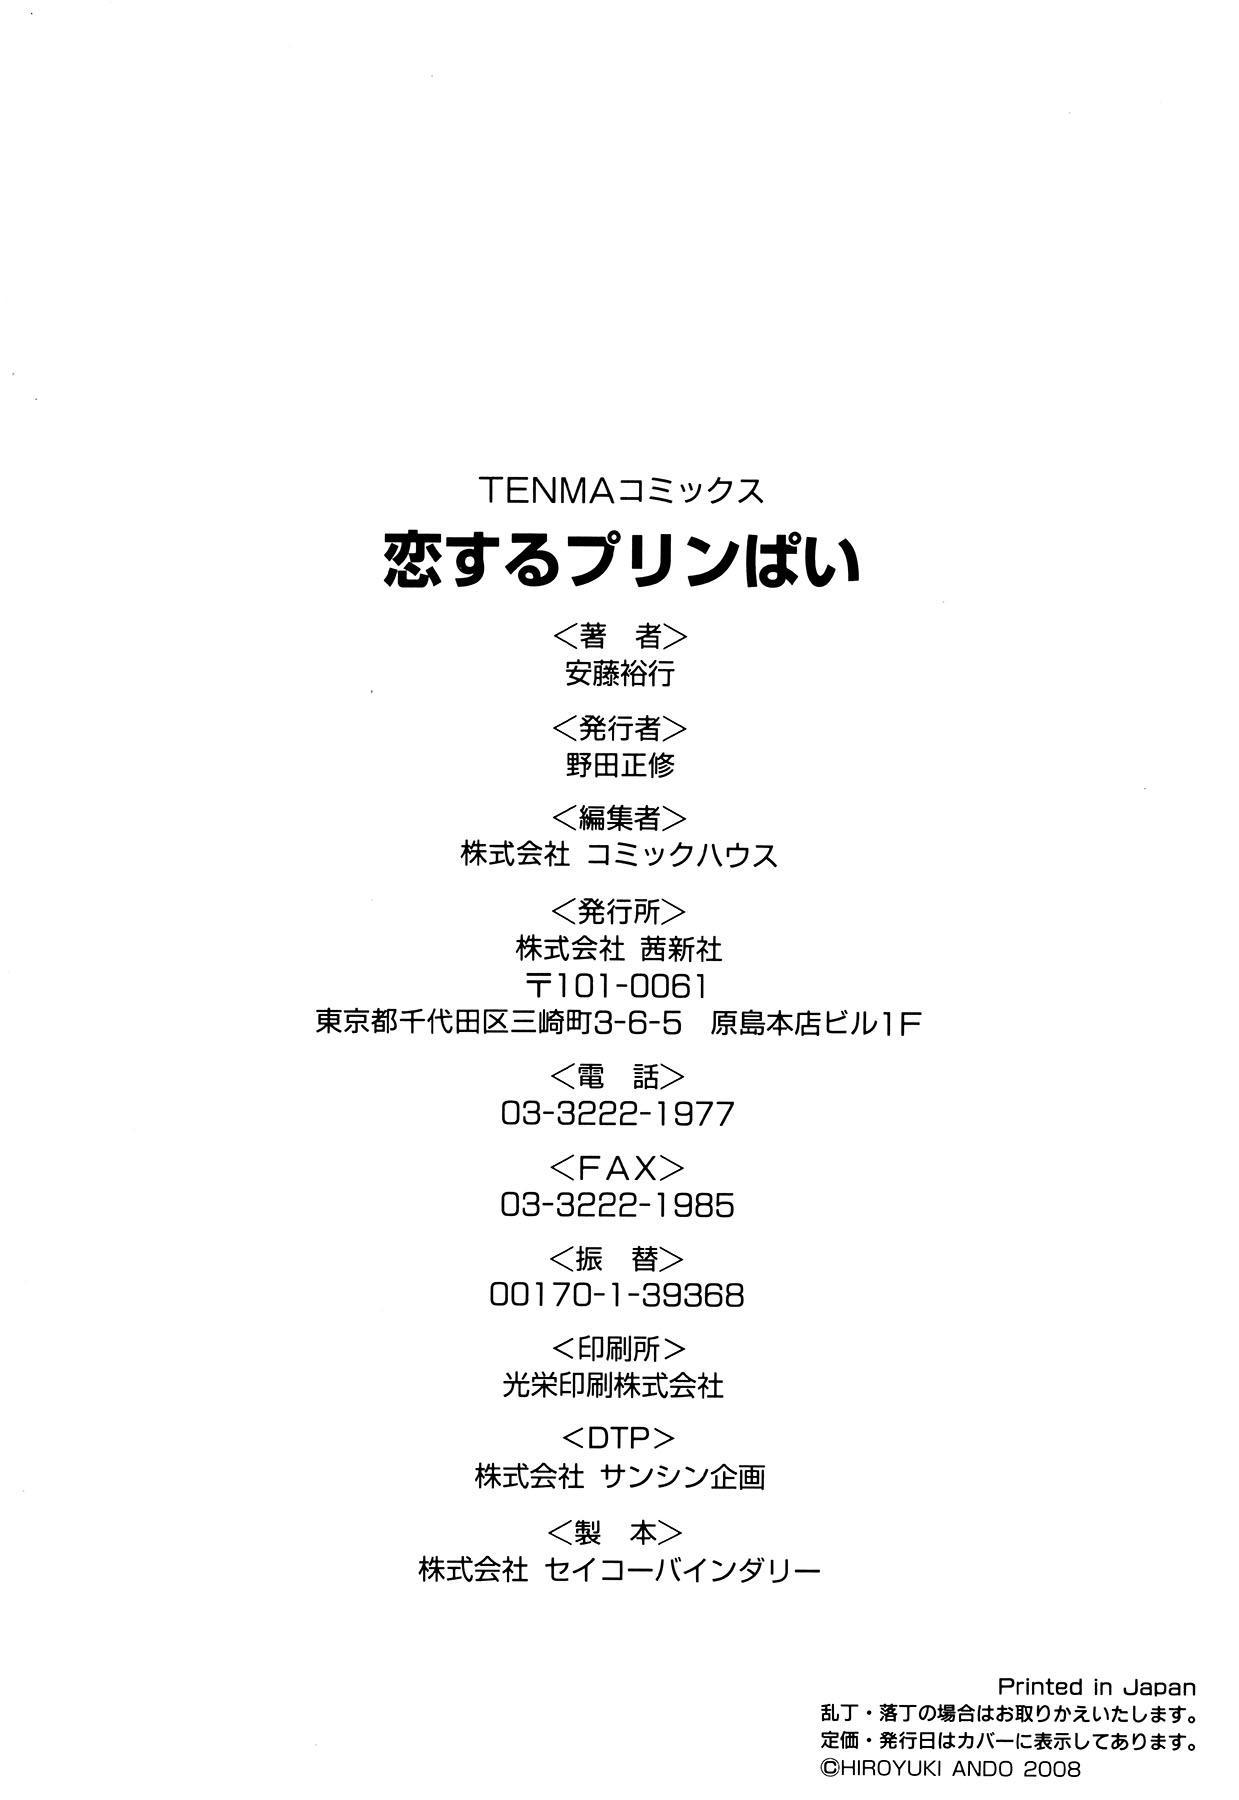 [Ando Hiroyuki] Koisuru Purin-Pai - Pudding-Pai Falling in Love [English] [Kusanyagi, Team Vanilla] 182